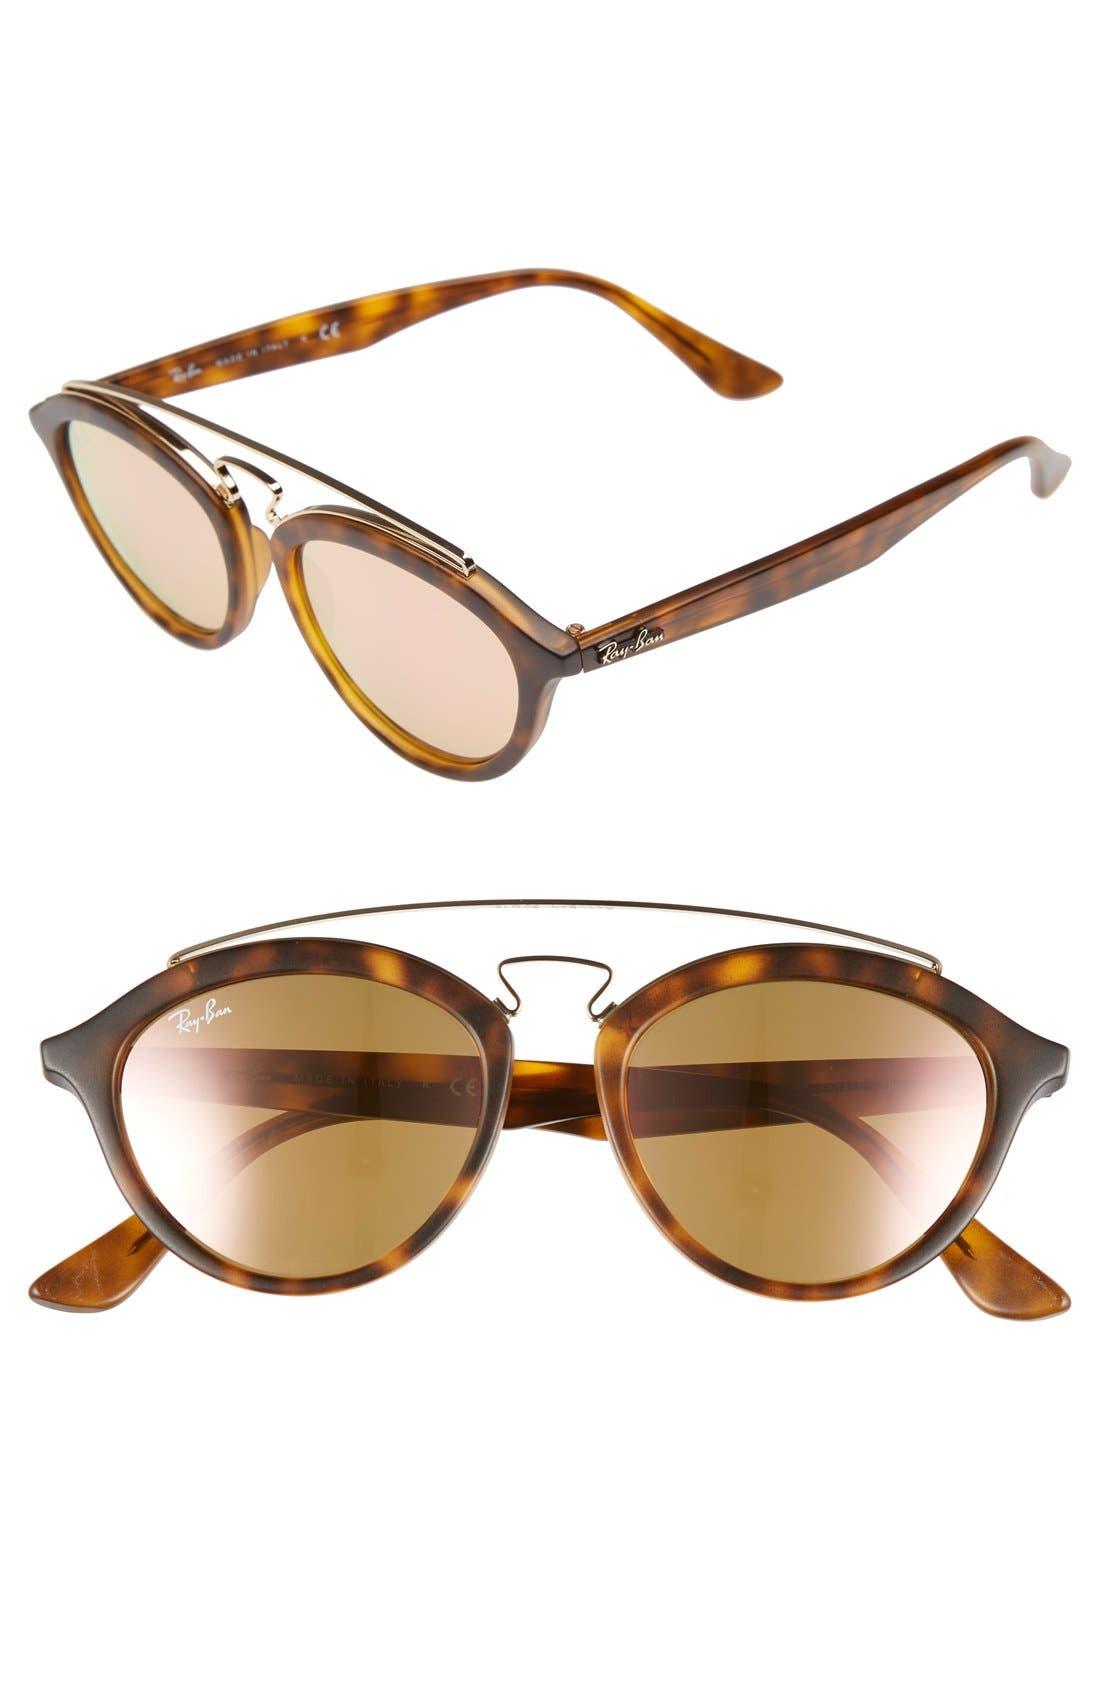 Highstreet 50mm Brow Bar Sunglasses,                             Main thumbnail 6, color,